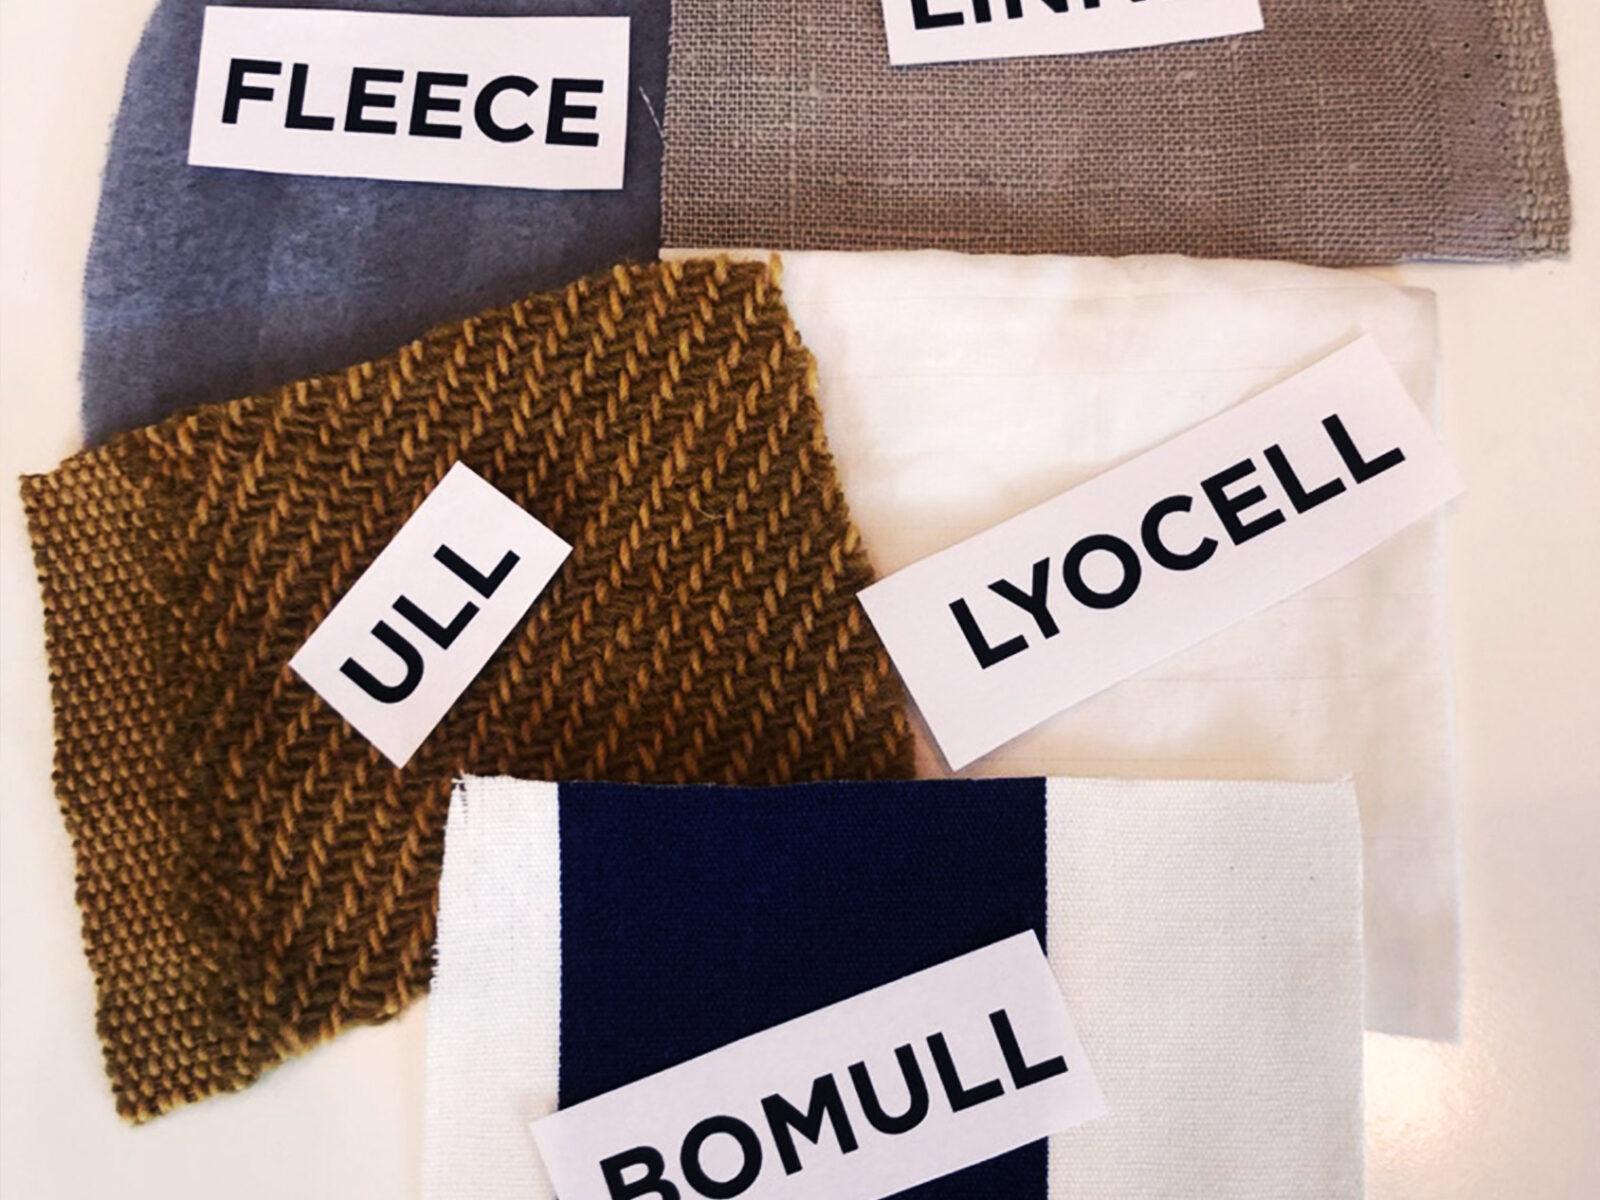 textil, textilkit, skolprogram, högstadiet, ikea, textilövning